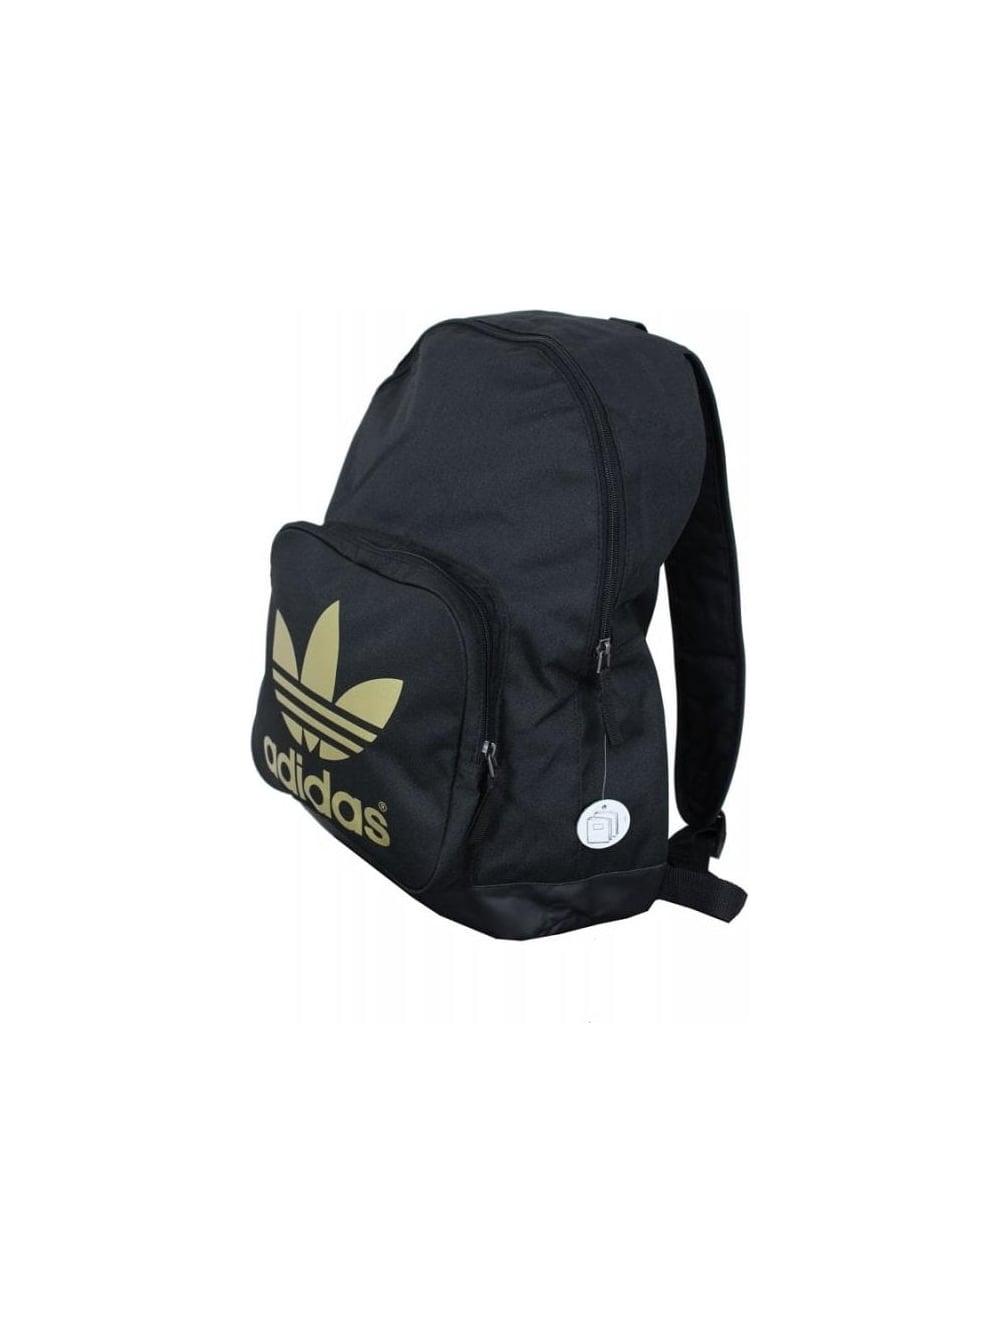 a8da17cd585f Adidas Originals AC Classic Backpack in Black Gold - Northern Threads